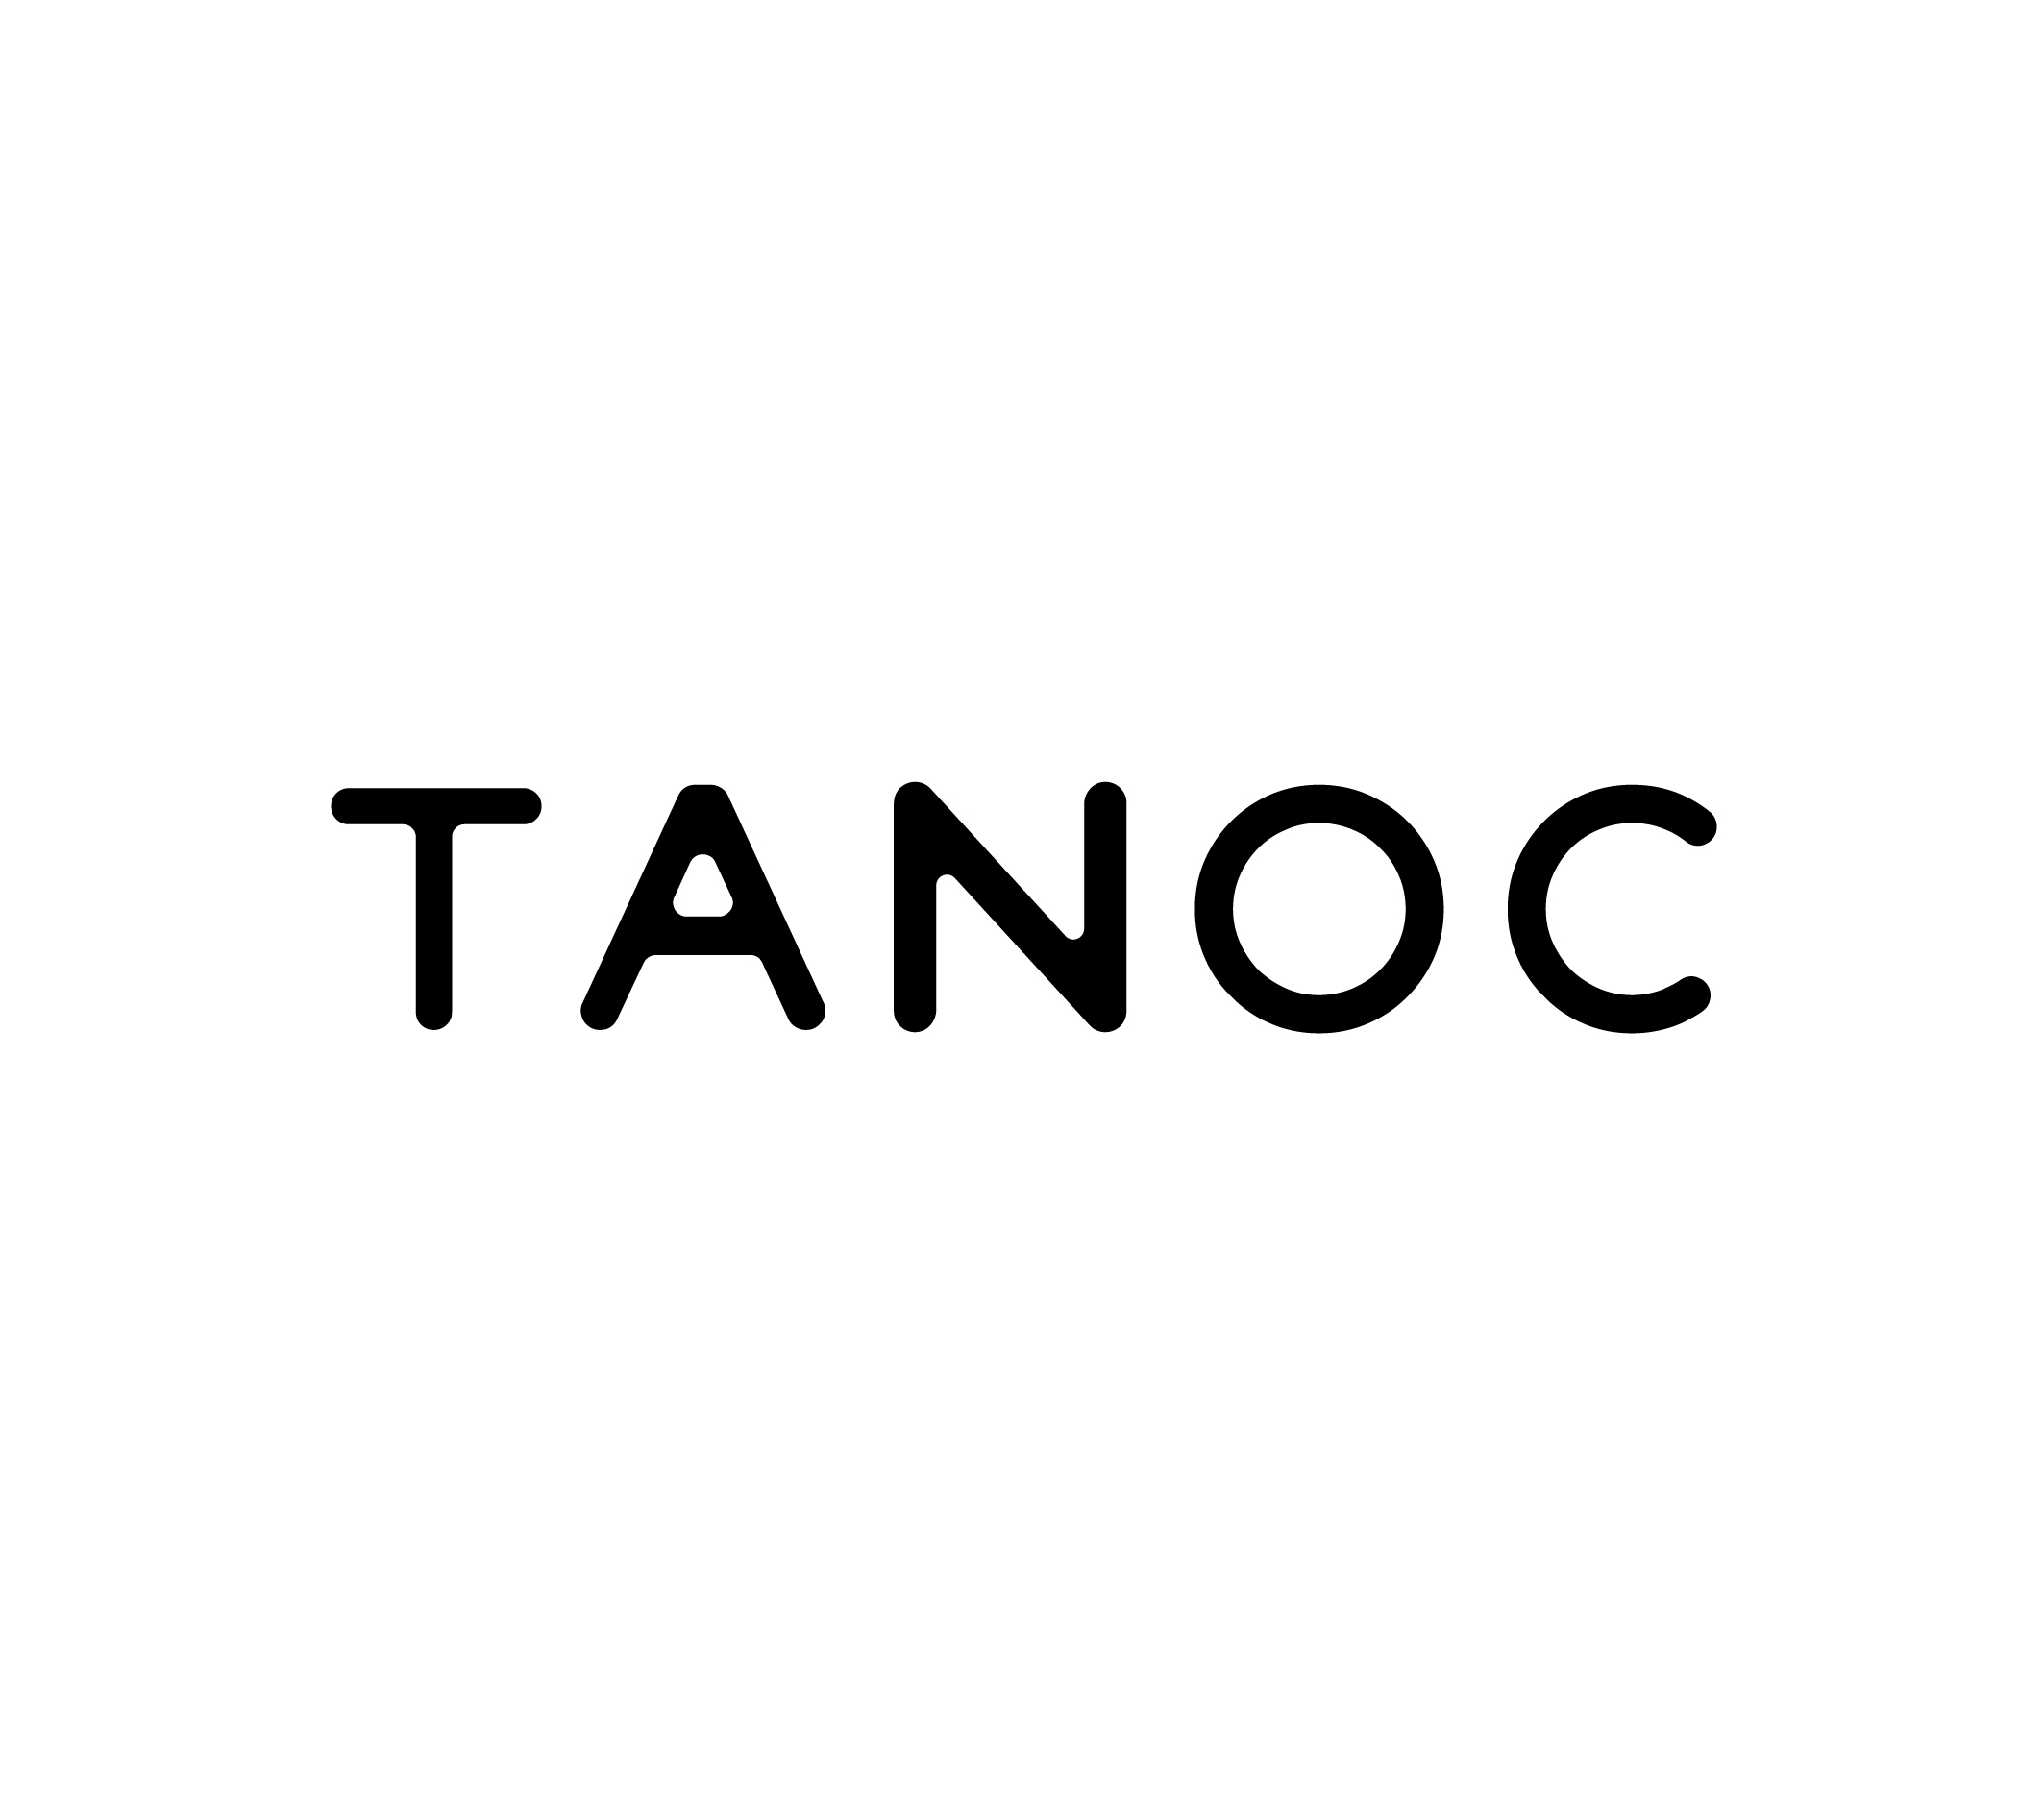 tanoclogo